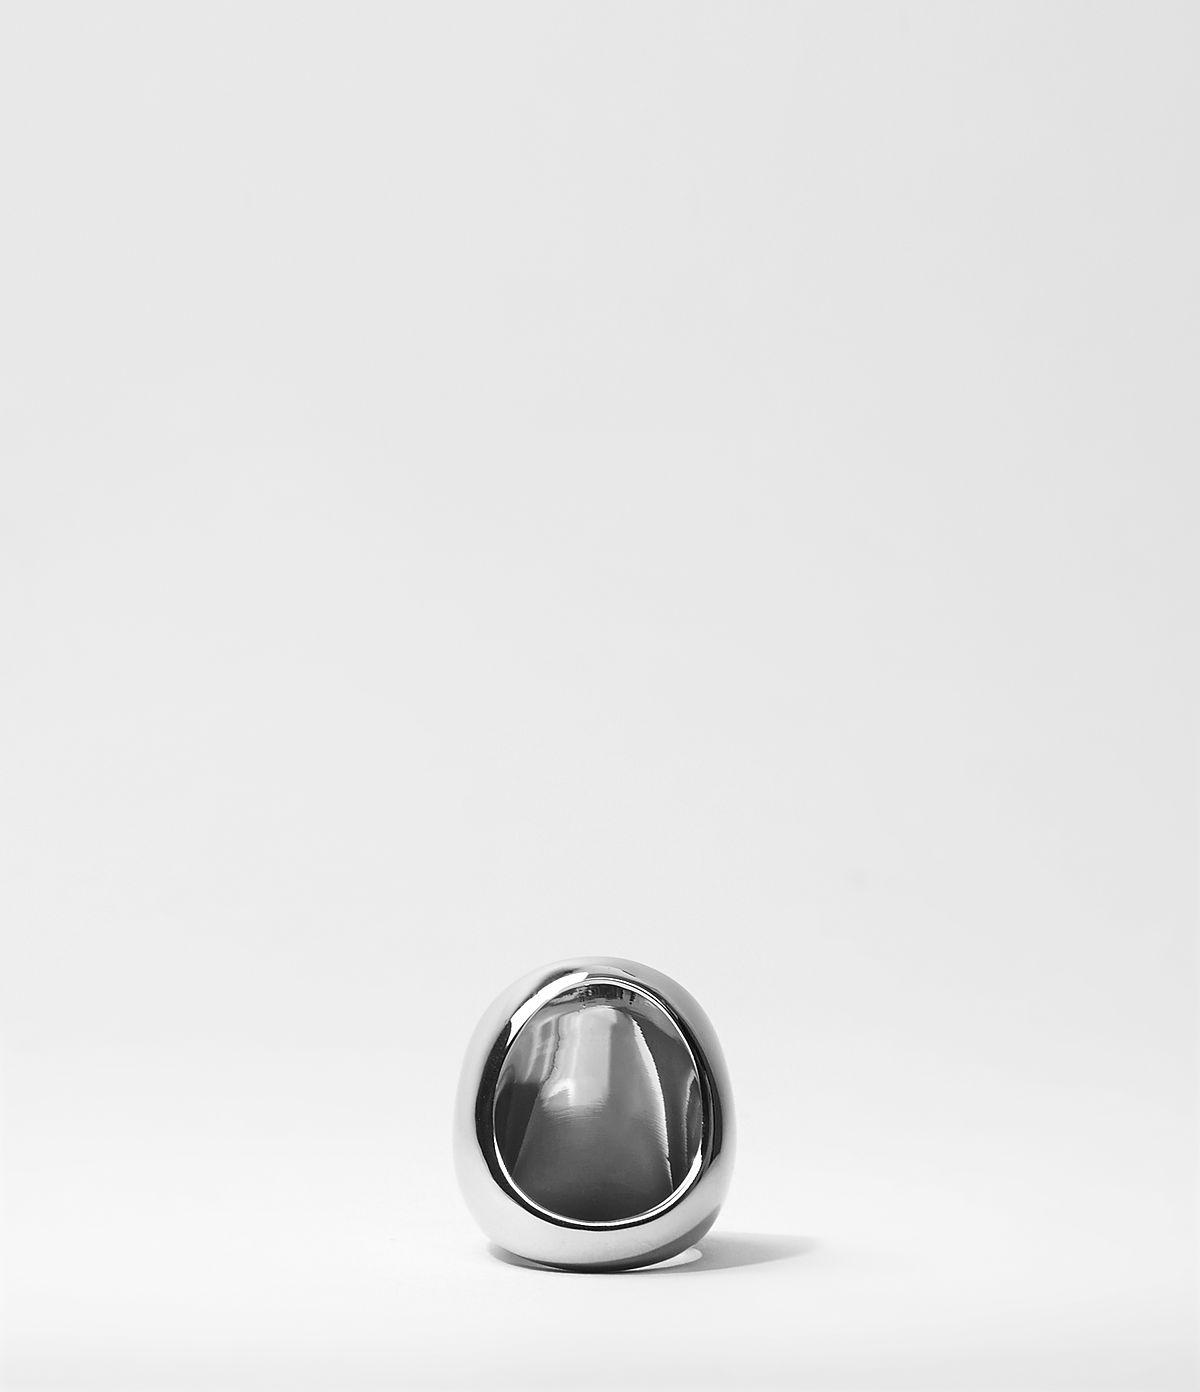 AllSaints Signet Ring in Silver/Black (Metallic)